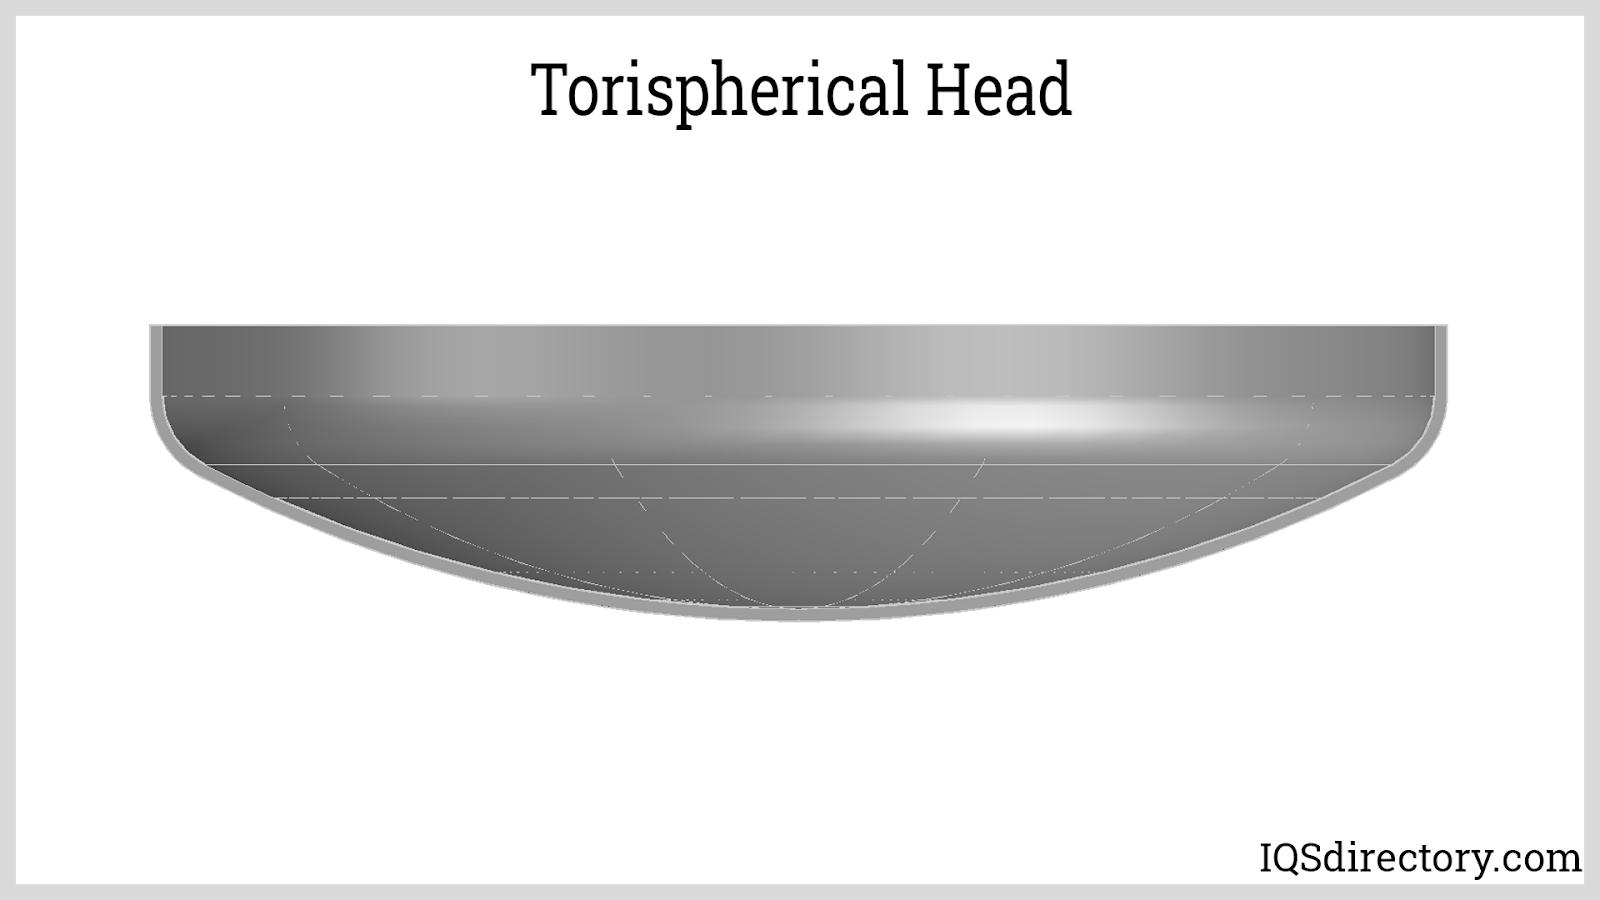 Torispherical Head